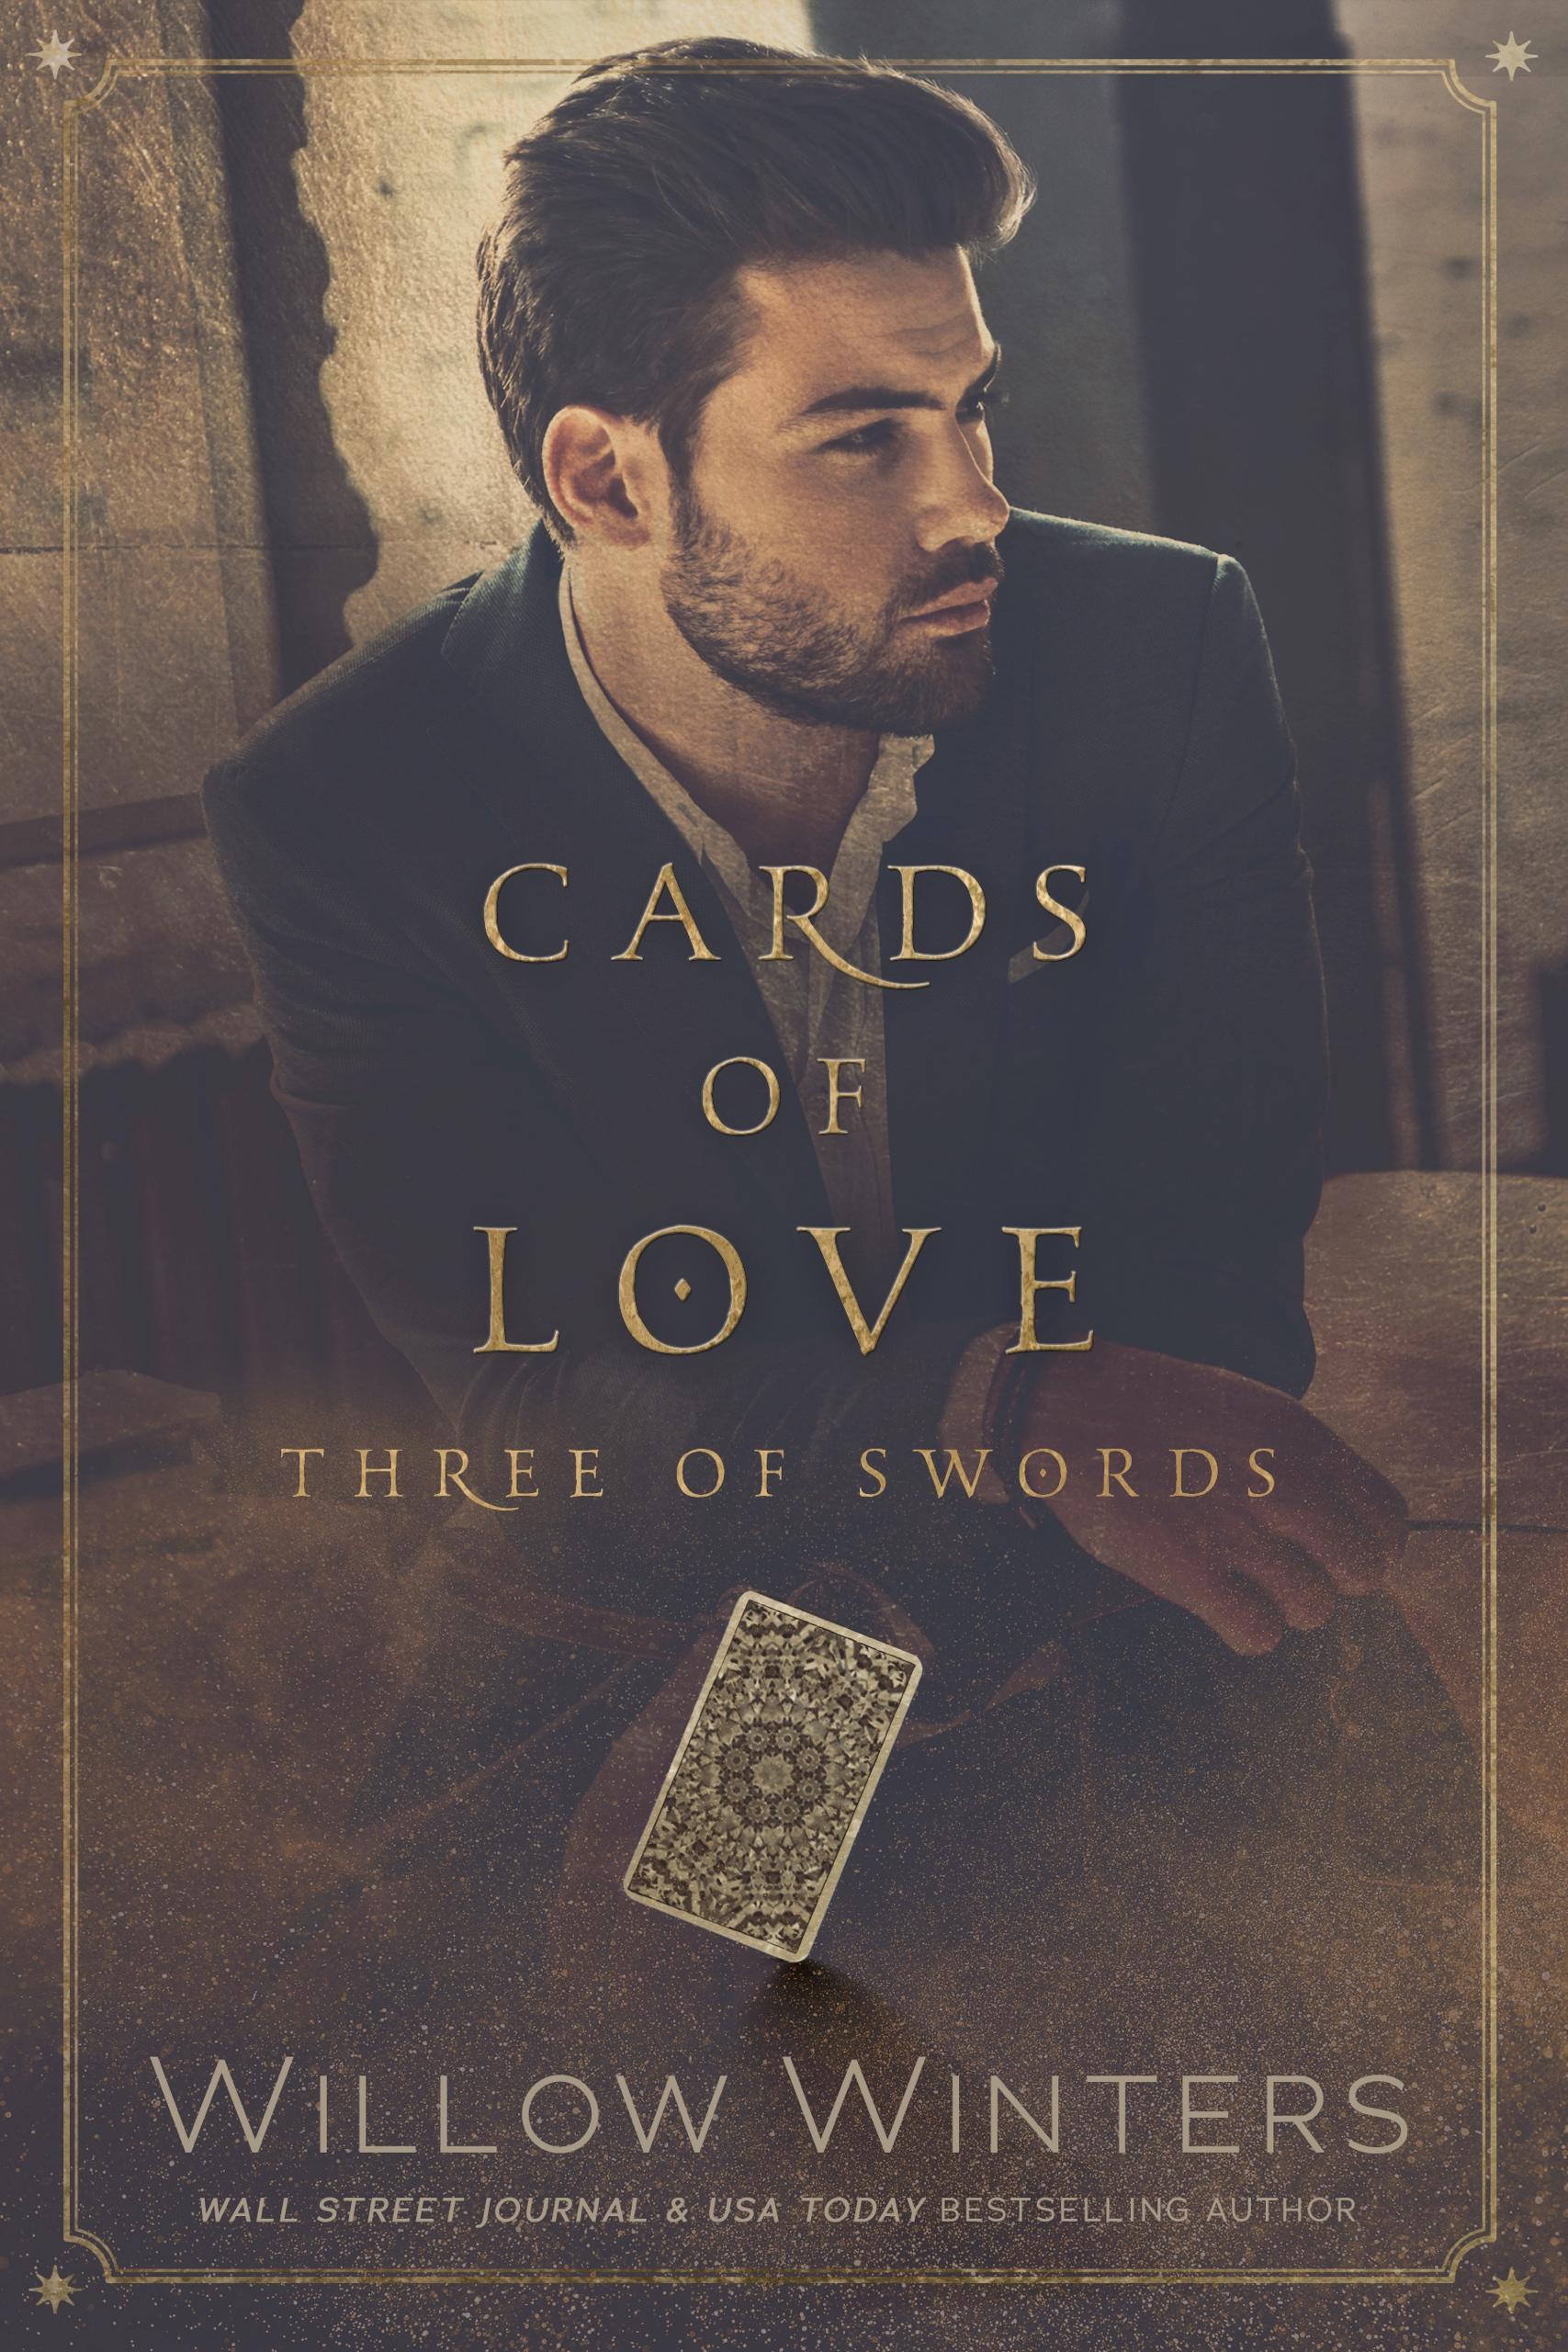 Cards-of-Love-Three-of-Swords-Google.jpg